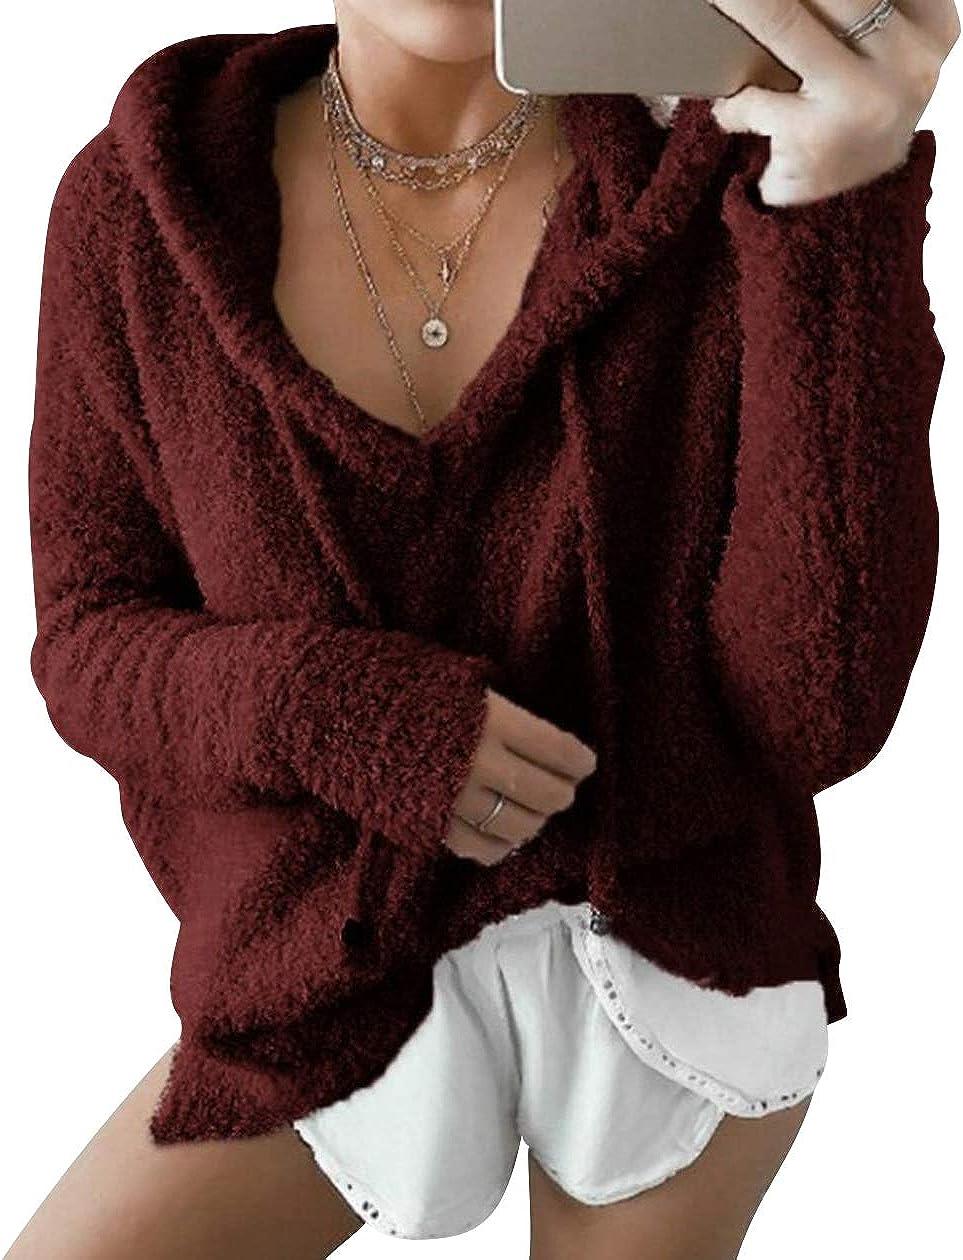 ISSHE Kapuzenpullover Damen Teddy Fleece Pullover V Ausschnitt Hoodie Pulli Sweatshirt Fleecepullover Oversized Hoodies f/ür Damen Pullis Langarm Warme Frauen Fleecemantel Sweater Damenpulli Warm